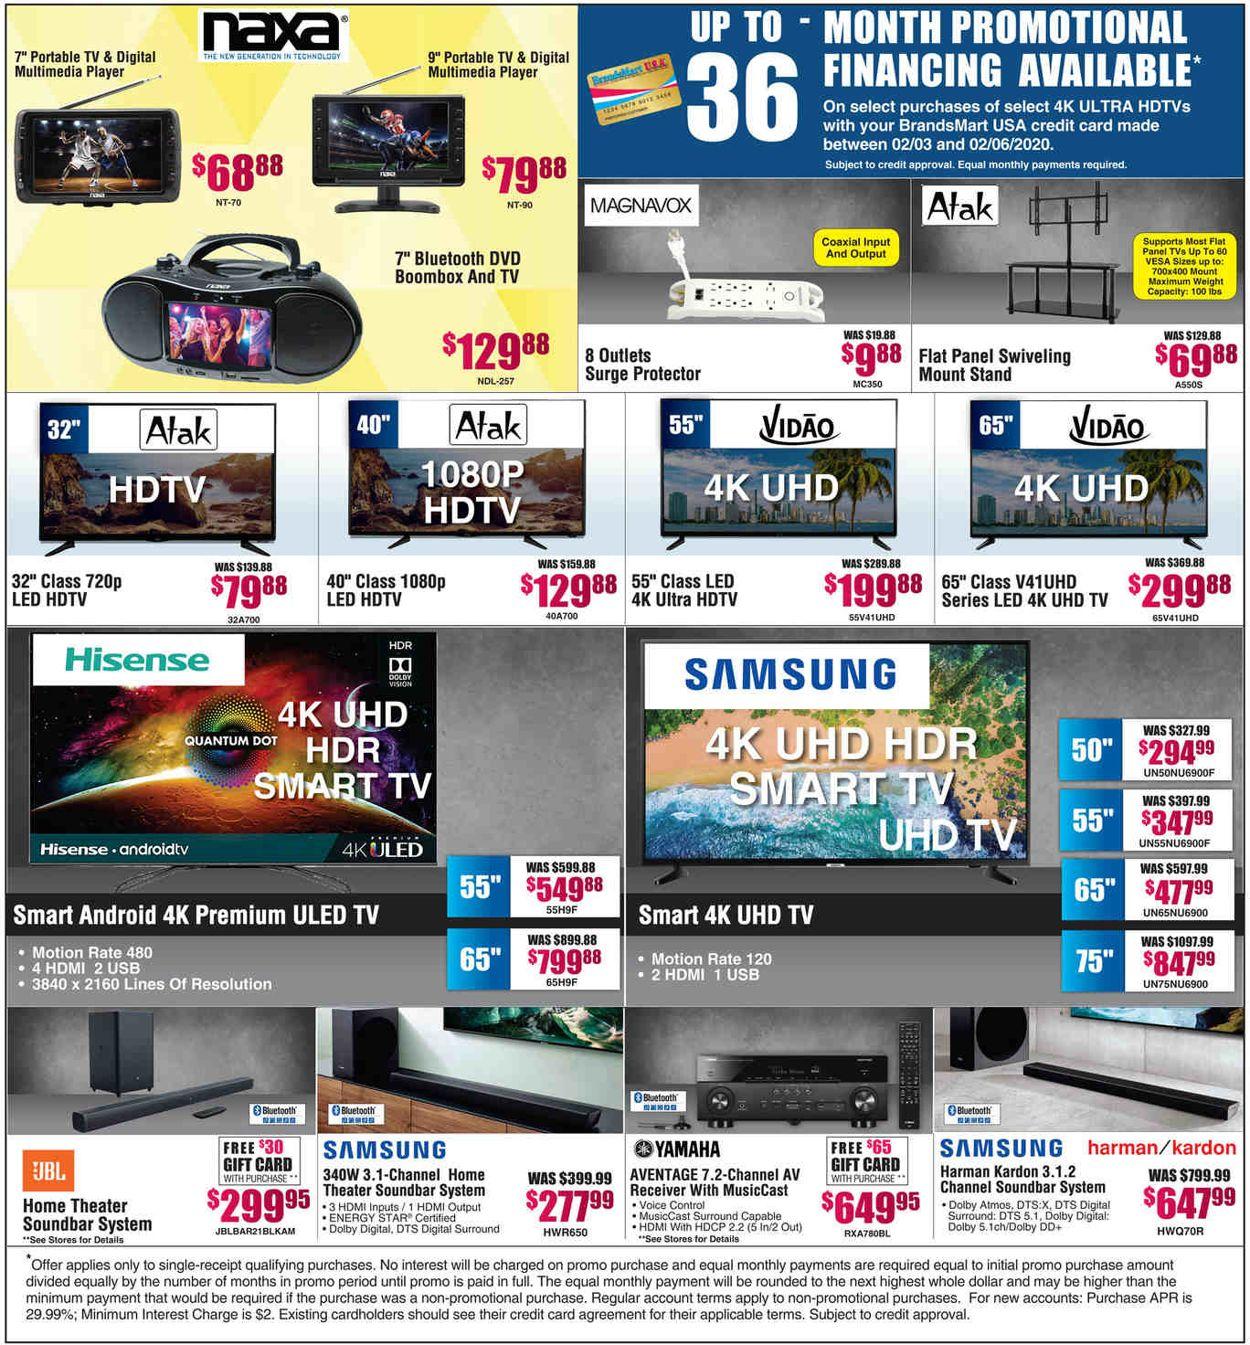 Catalogue Brandsmart USA from 02/03/2020